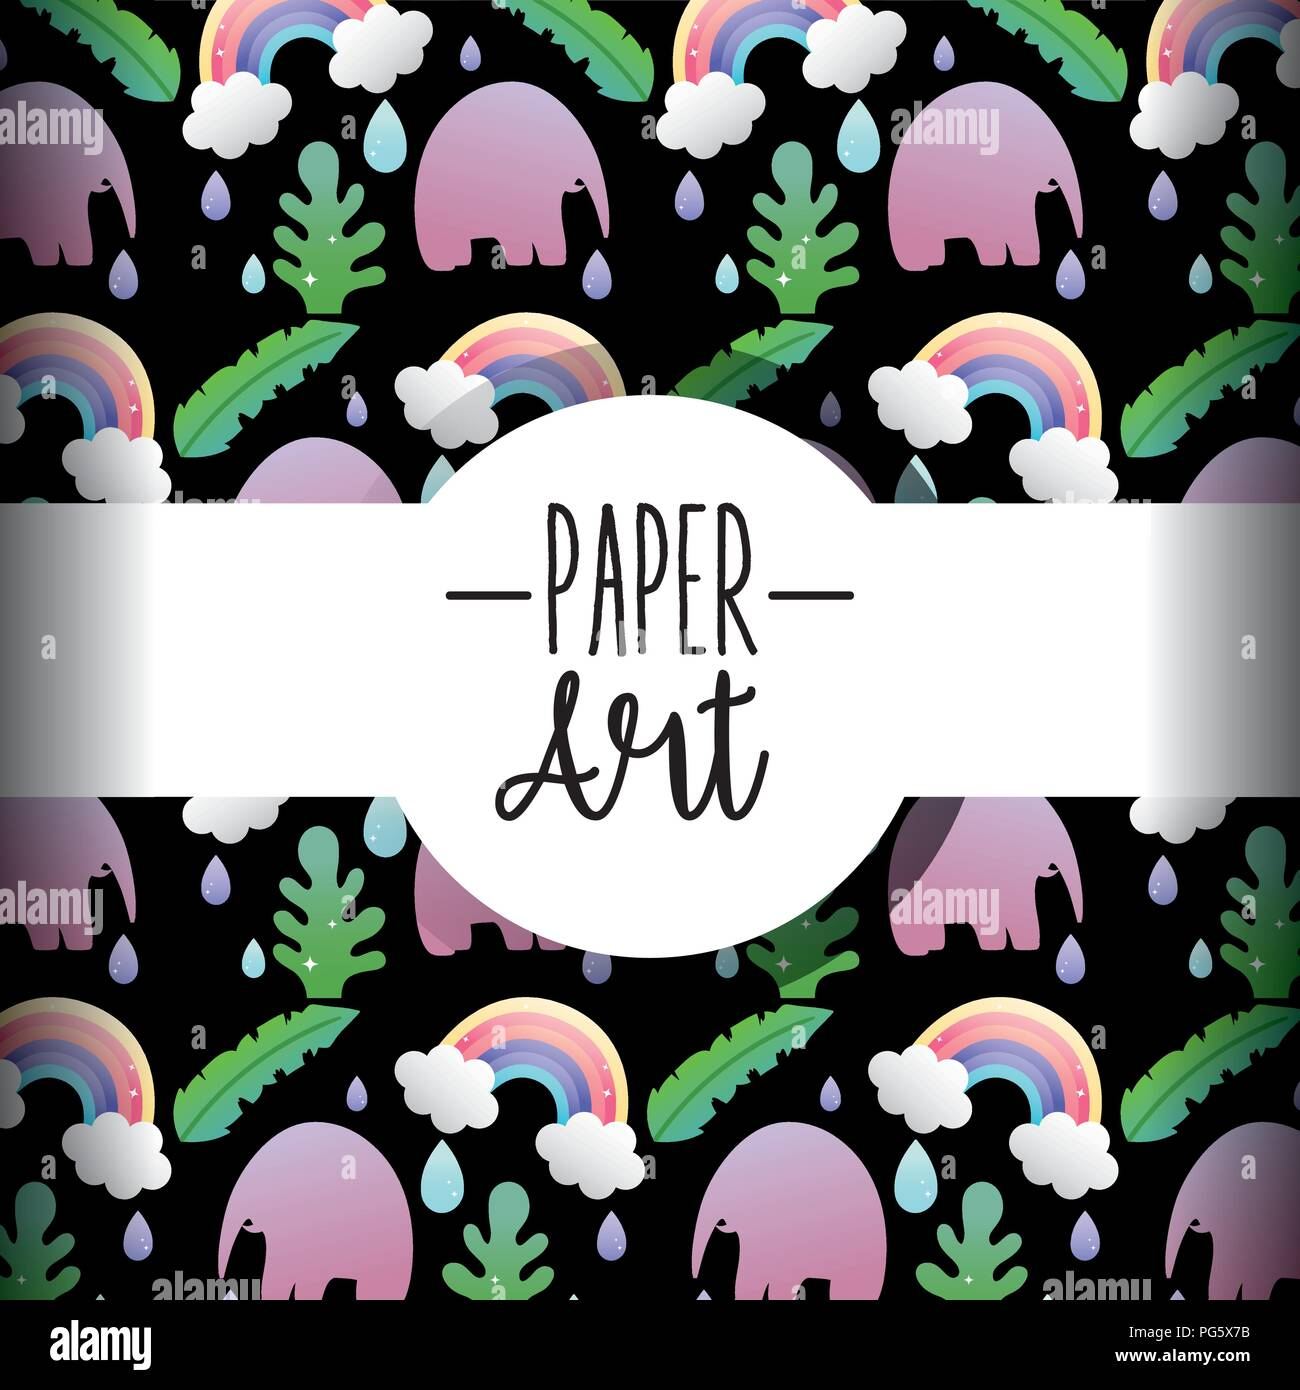 Paper art background - Stock Image